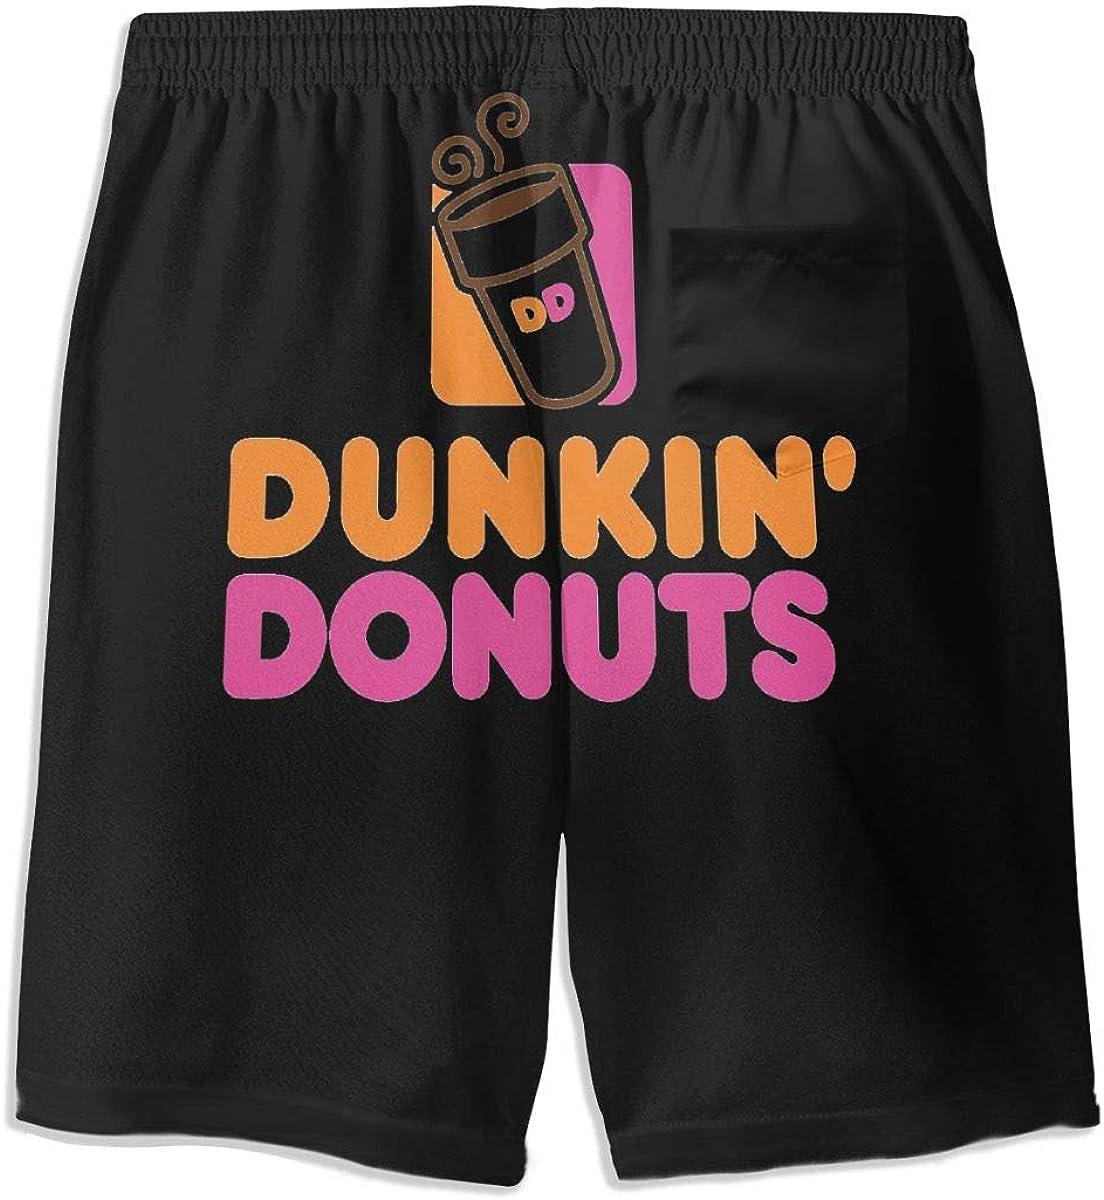 Dunkin Donuts Teenager Boys Beachwear Beach Shorts Pants Board Shorts